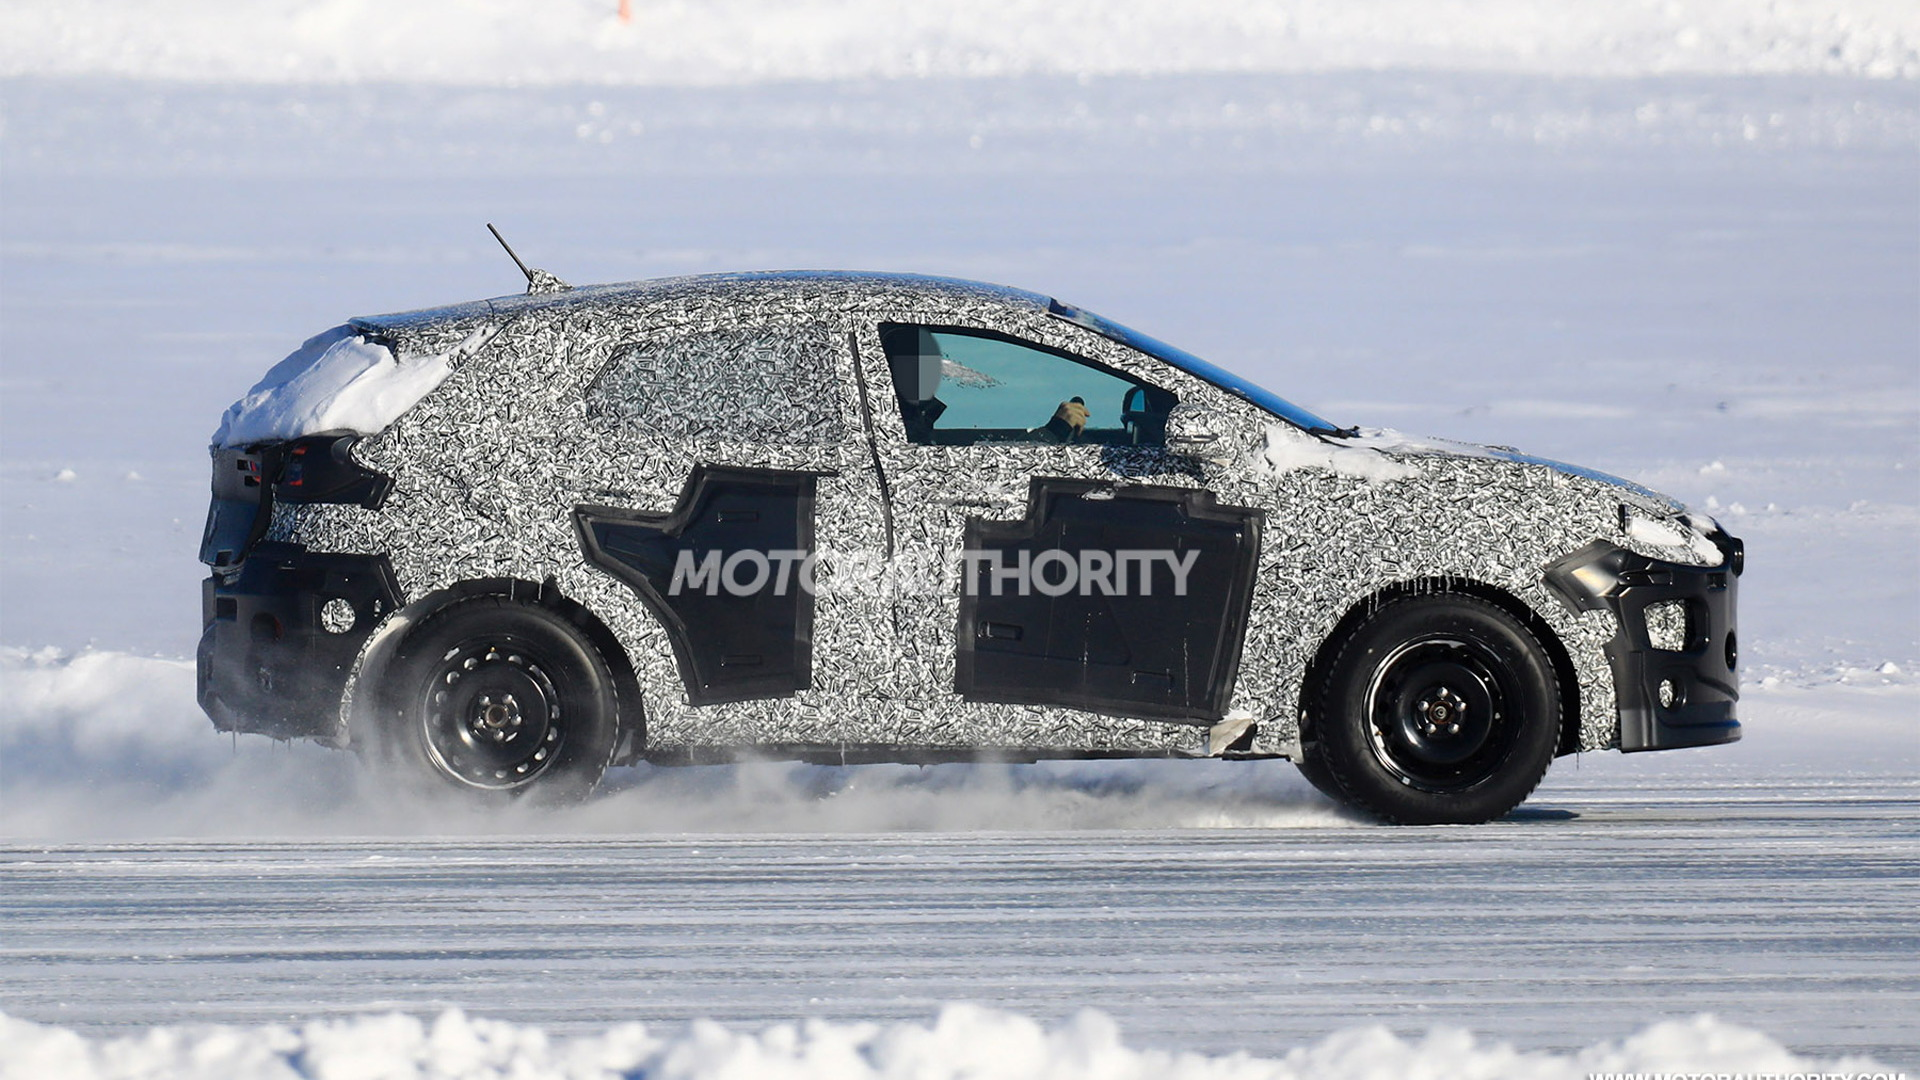 2022 Ford Ecosport replacement spy shots - Image via S. Baldauf/SB-Medien